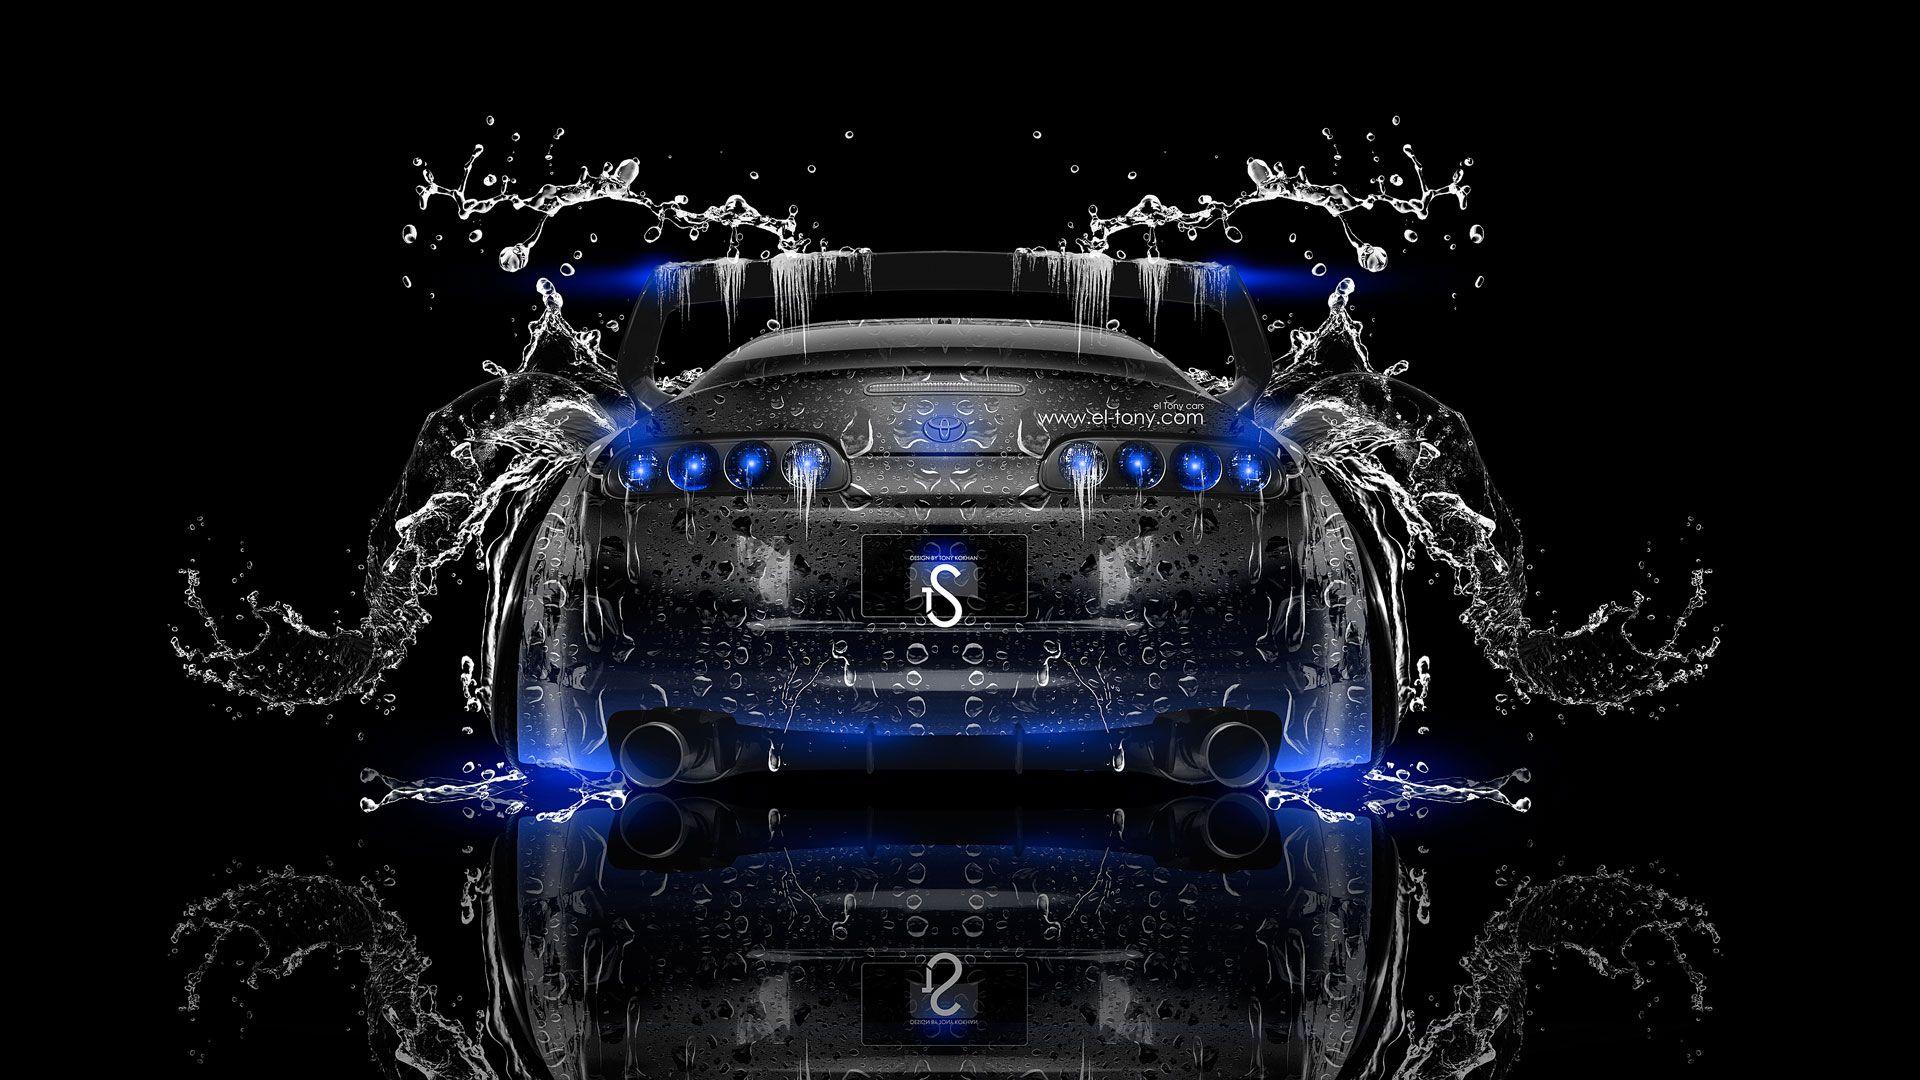 Amazing Toyota Supra JDM Back Water Car 2014 HD